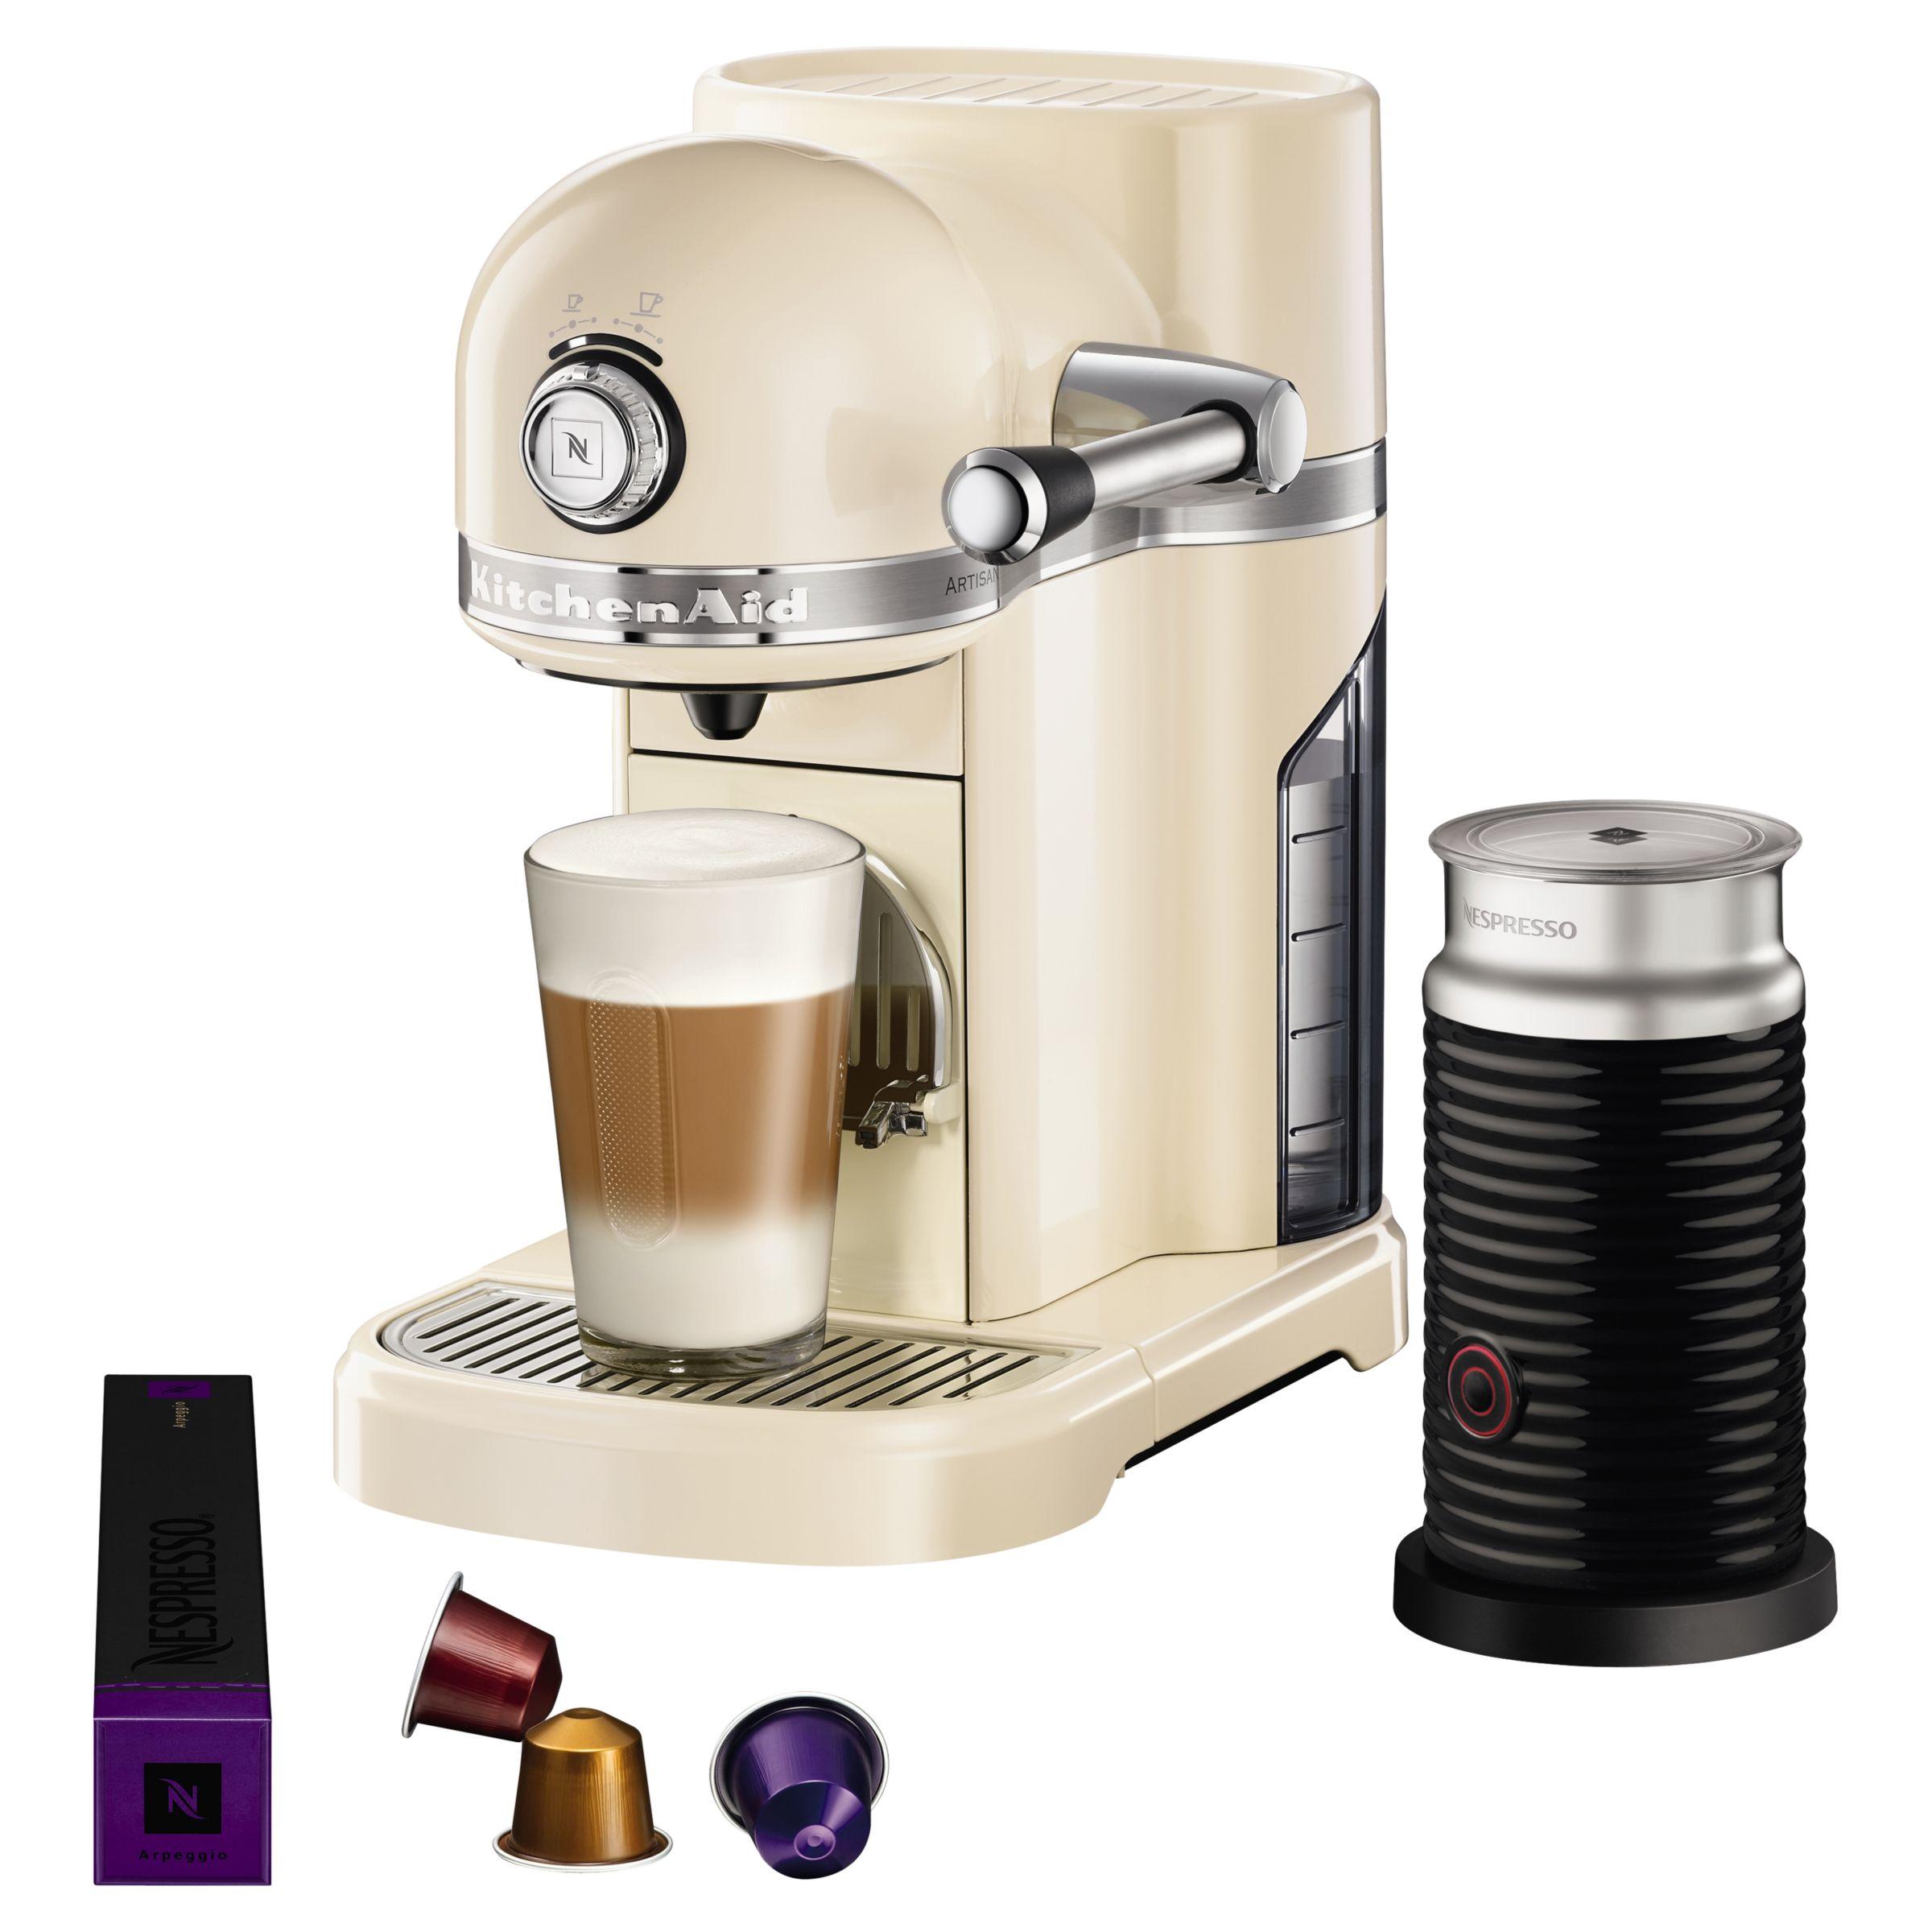 Nespresso Artisan Coffee Machine With Aeroccino By Kitchenaid Almond Cream